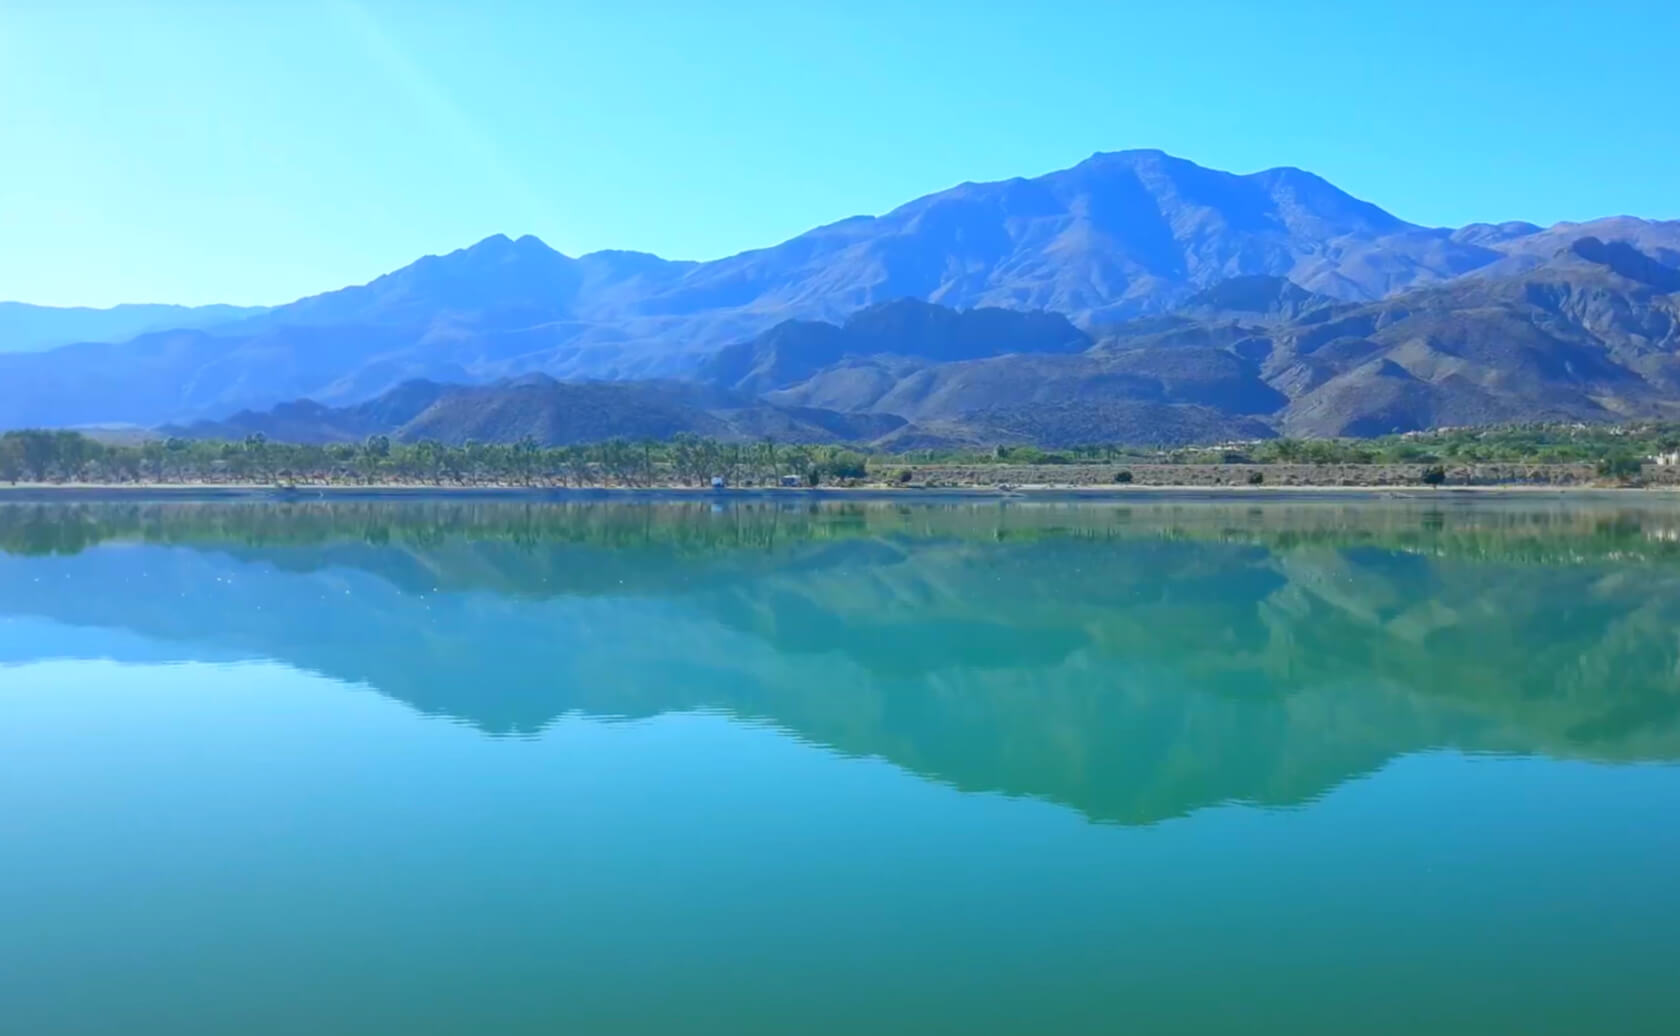 Cahuilla-Lake-Fishing-Guide-Report-La-Quinta-CA-15.jpg